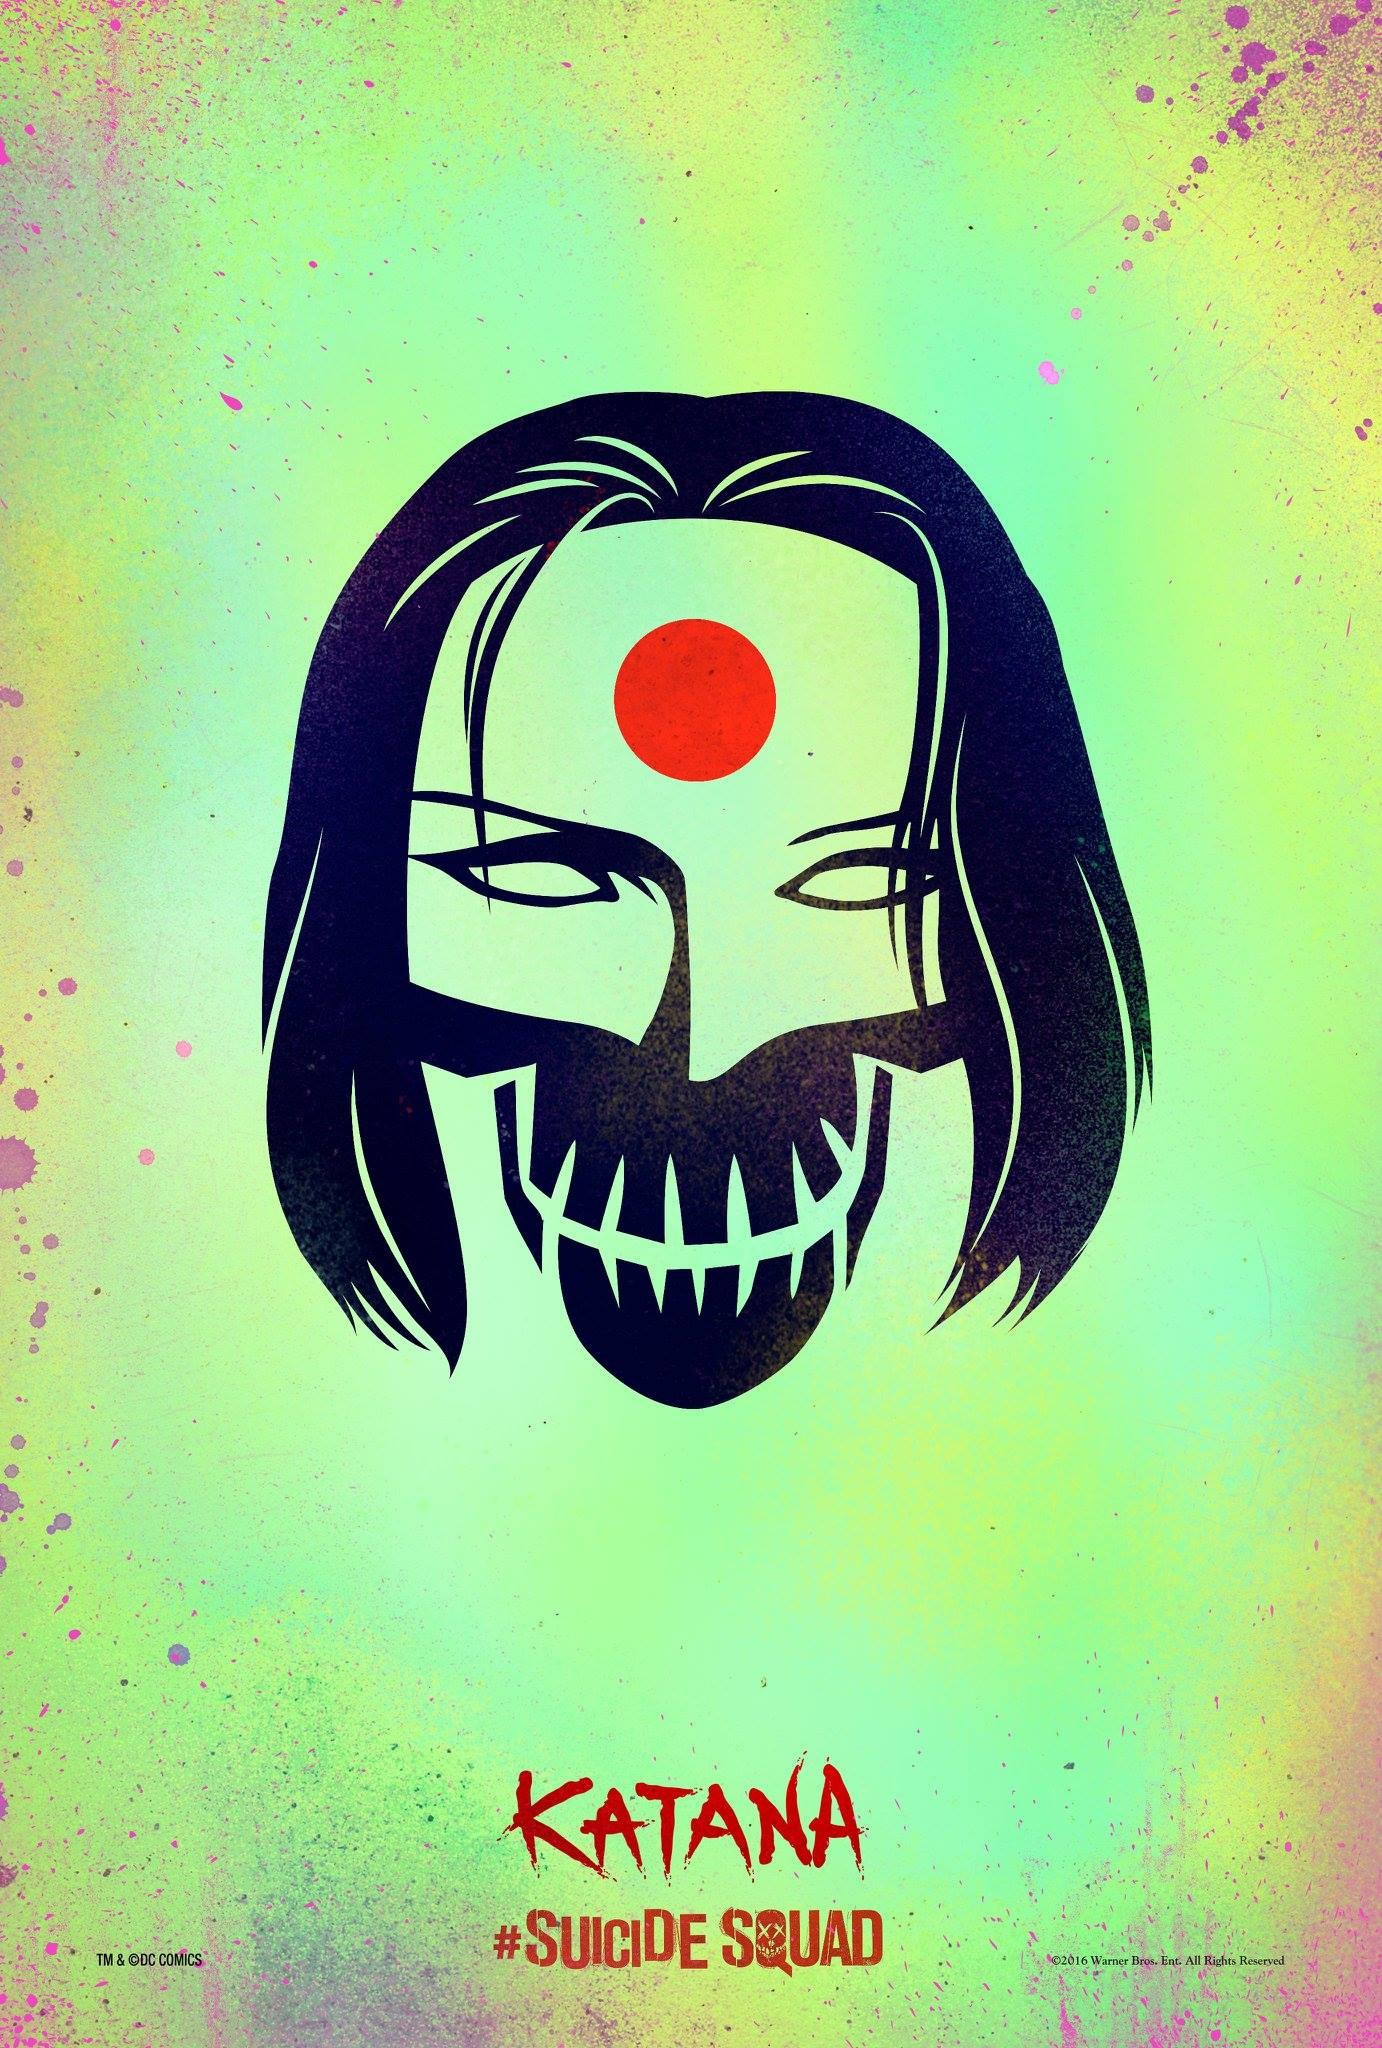 … suicide-squad-movie-poster-katana